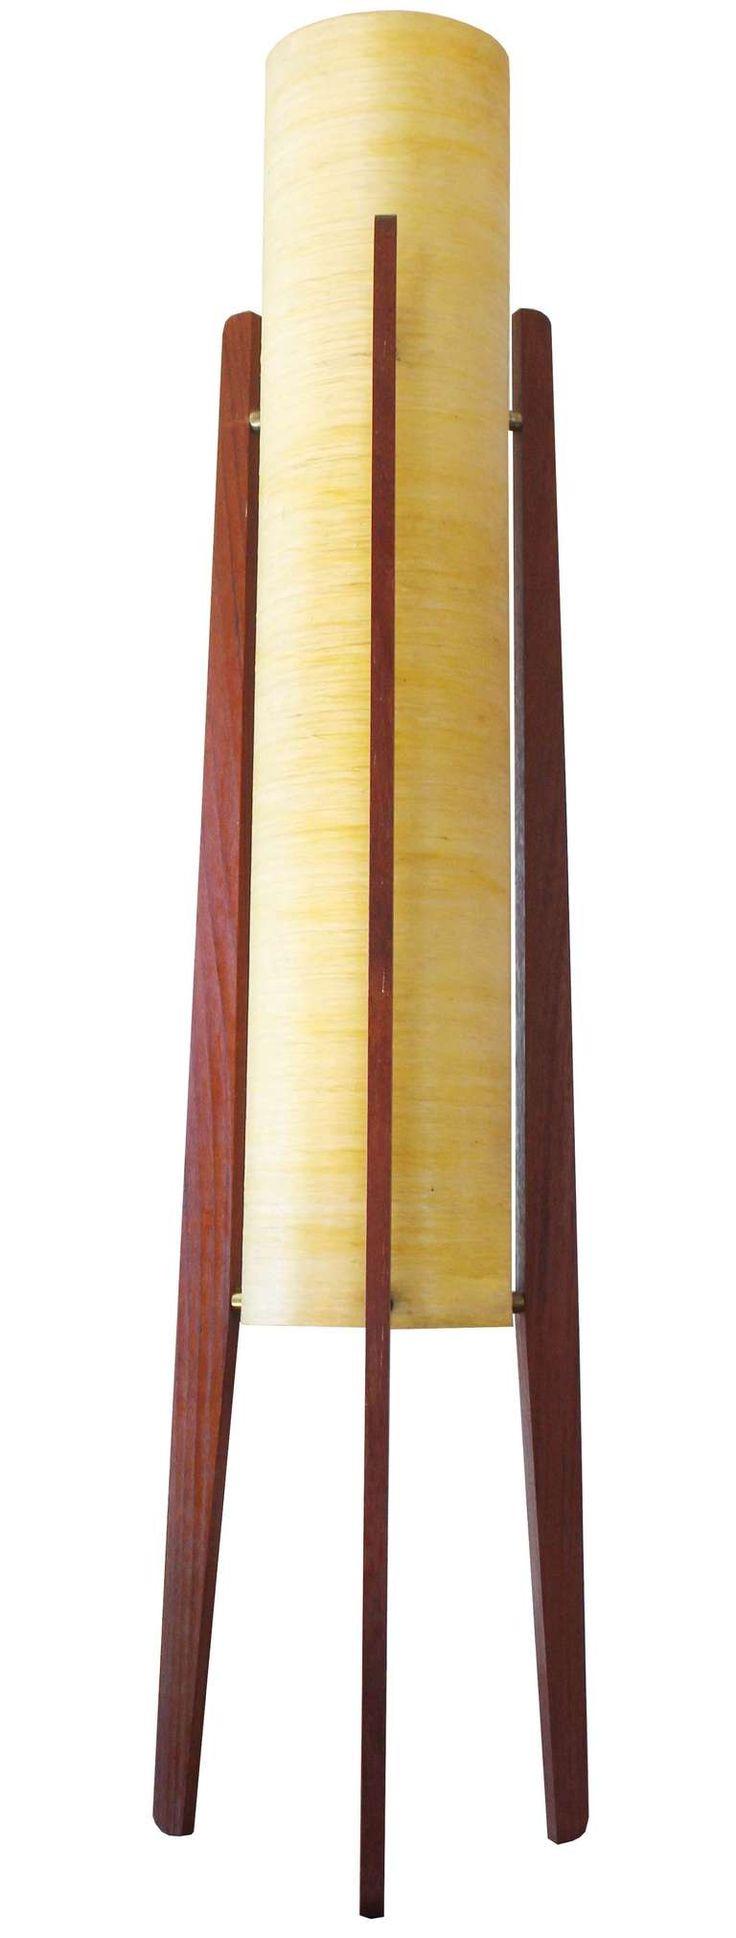 Danish Rocket Lamp  Unique LampsModern Table. Top 25  best Modern table lamps ideas on Pinterest   Table lamp